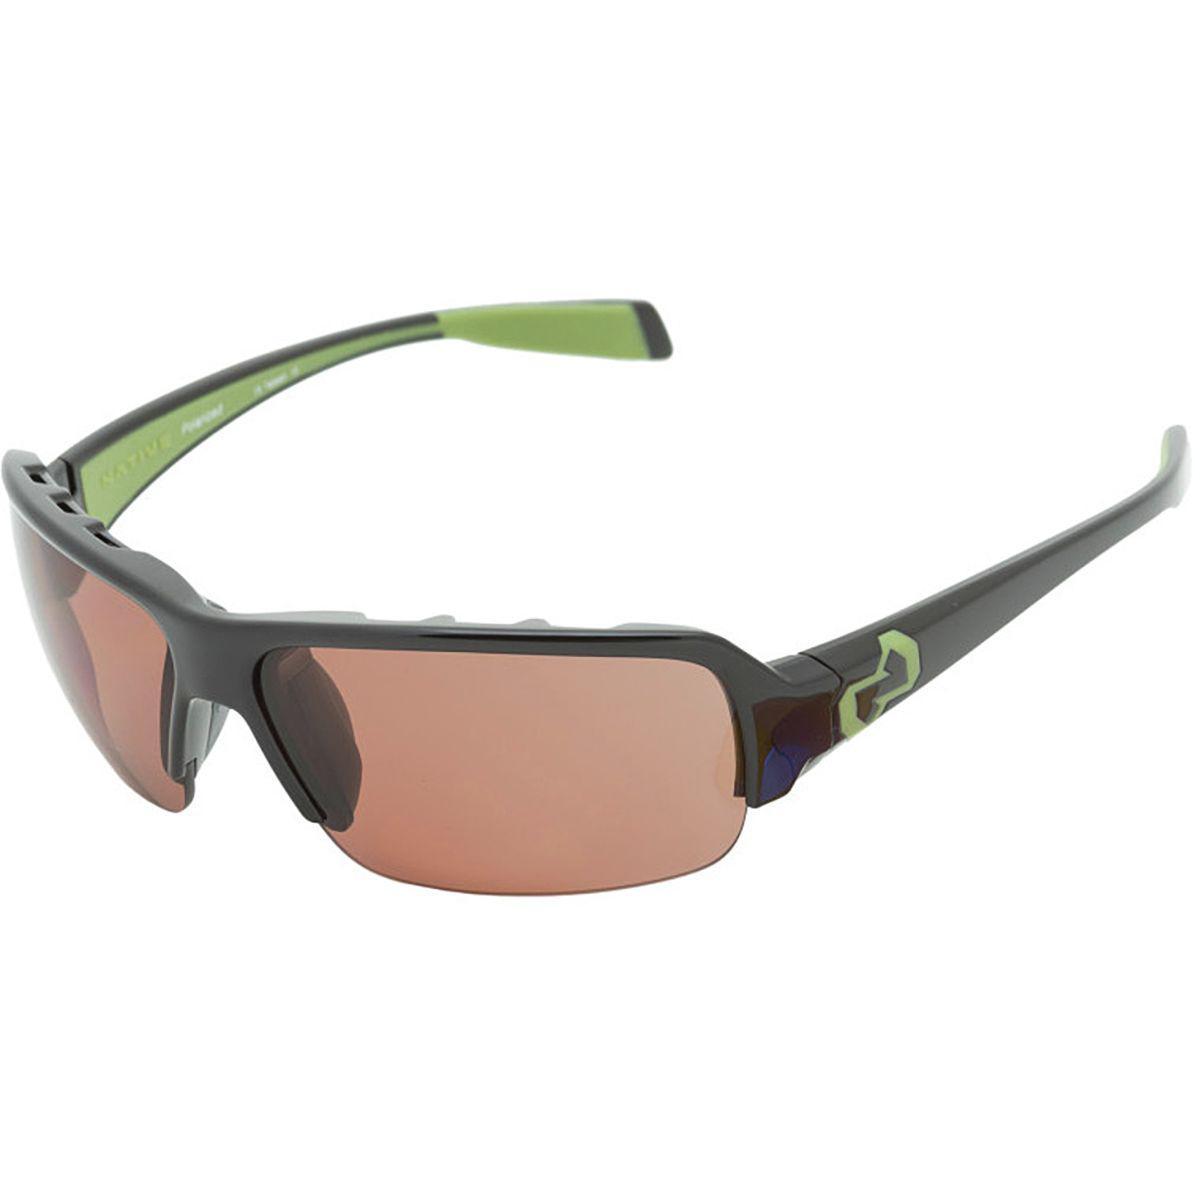 5202fcb49f3 Lyst - Native Eyewear Itso Polarized Sunglasses for Men